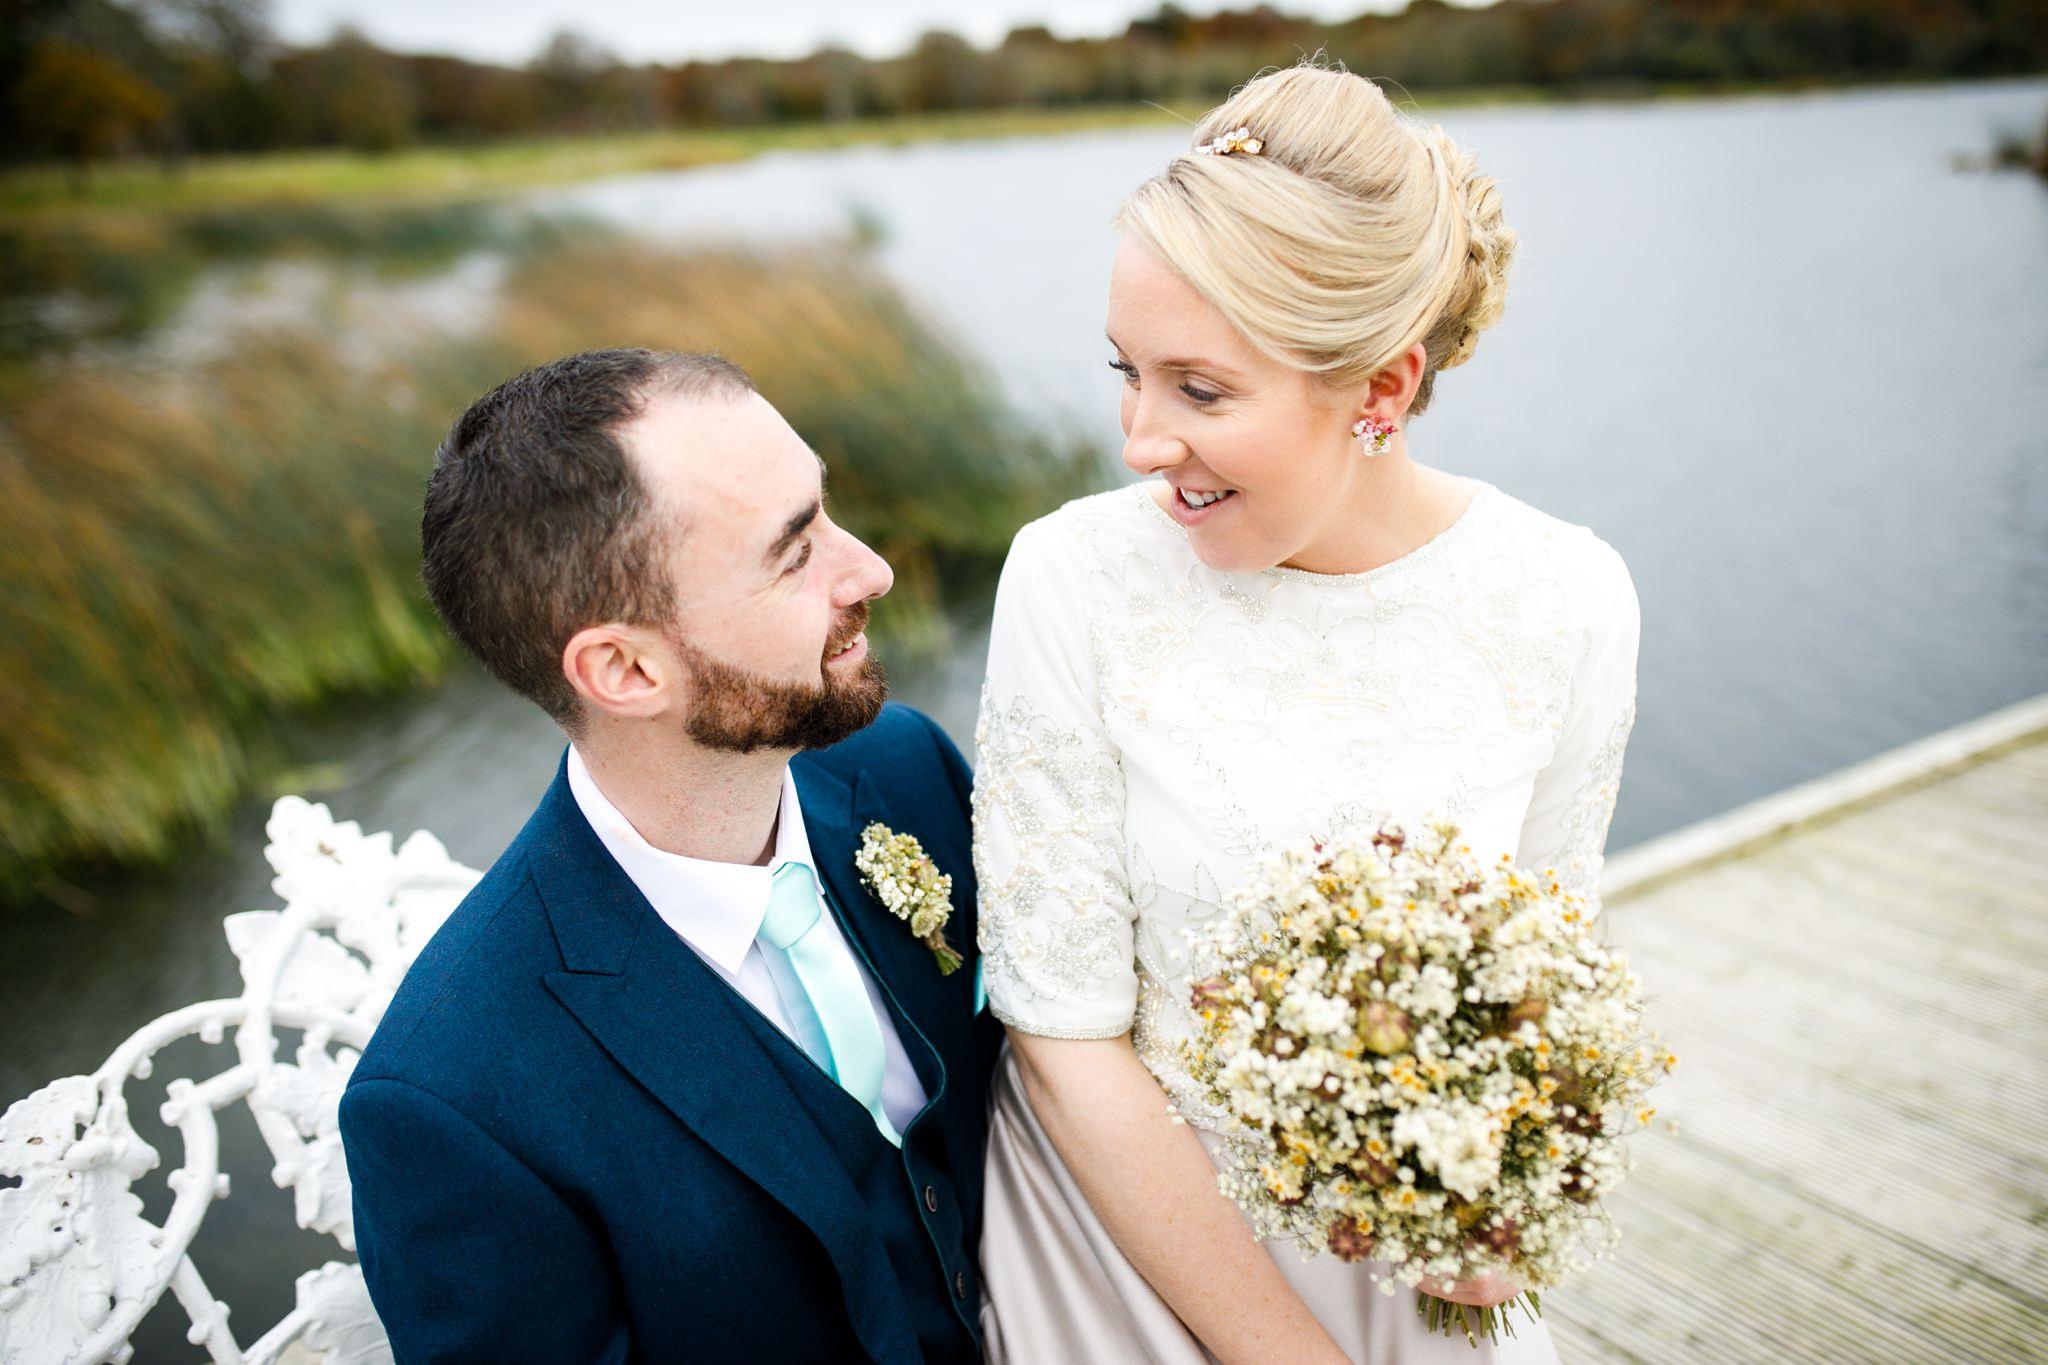 Elisha-Clarke-Photography-Dublin-City-Wedding_0090.jpg